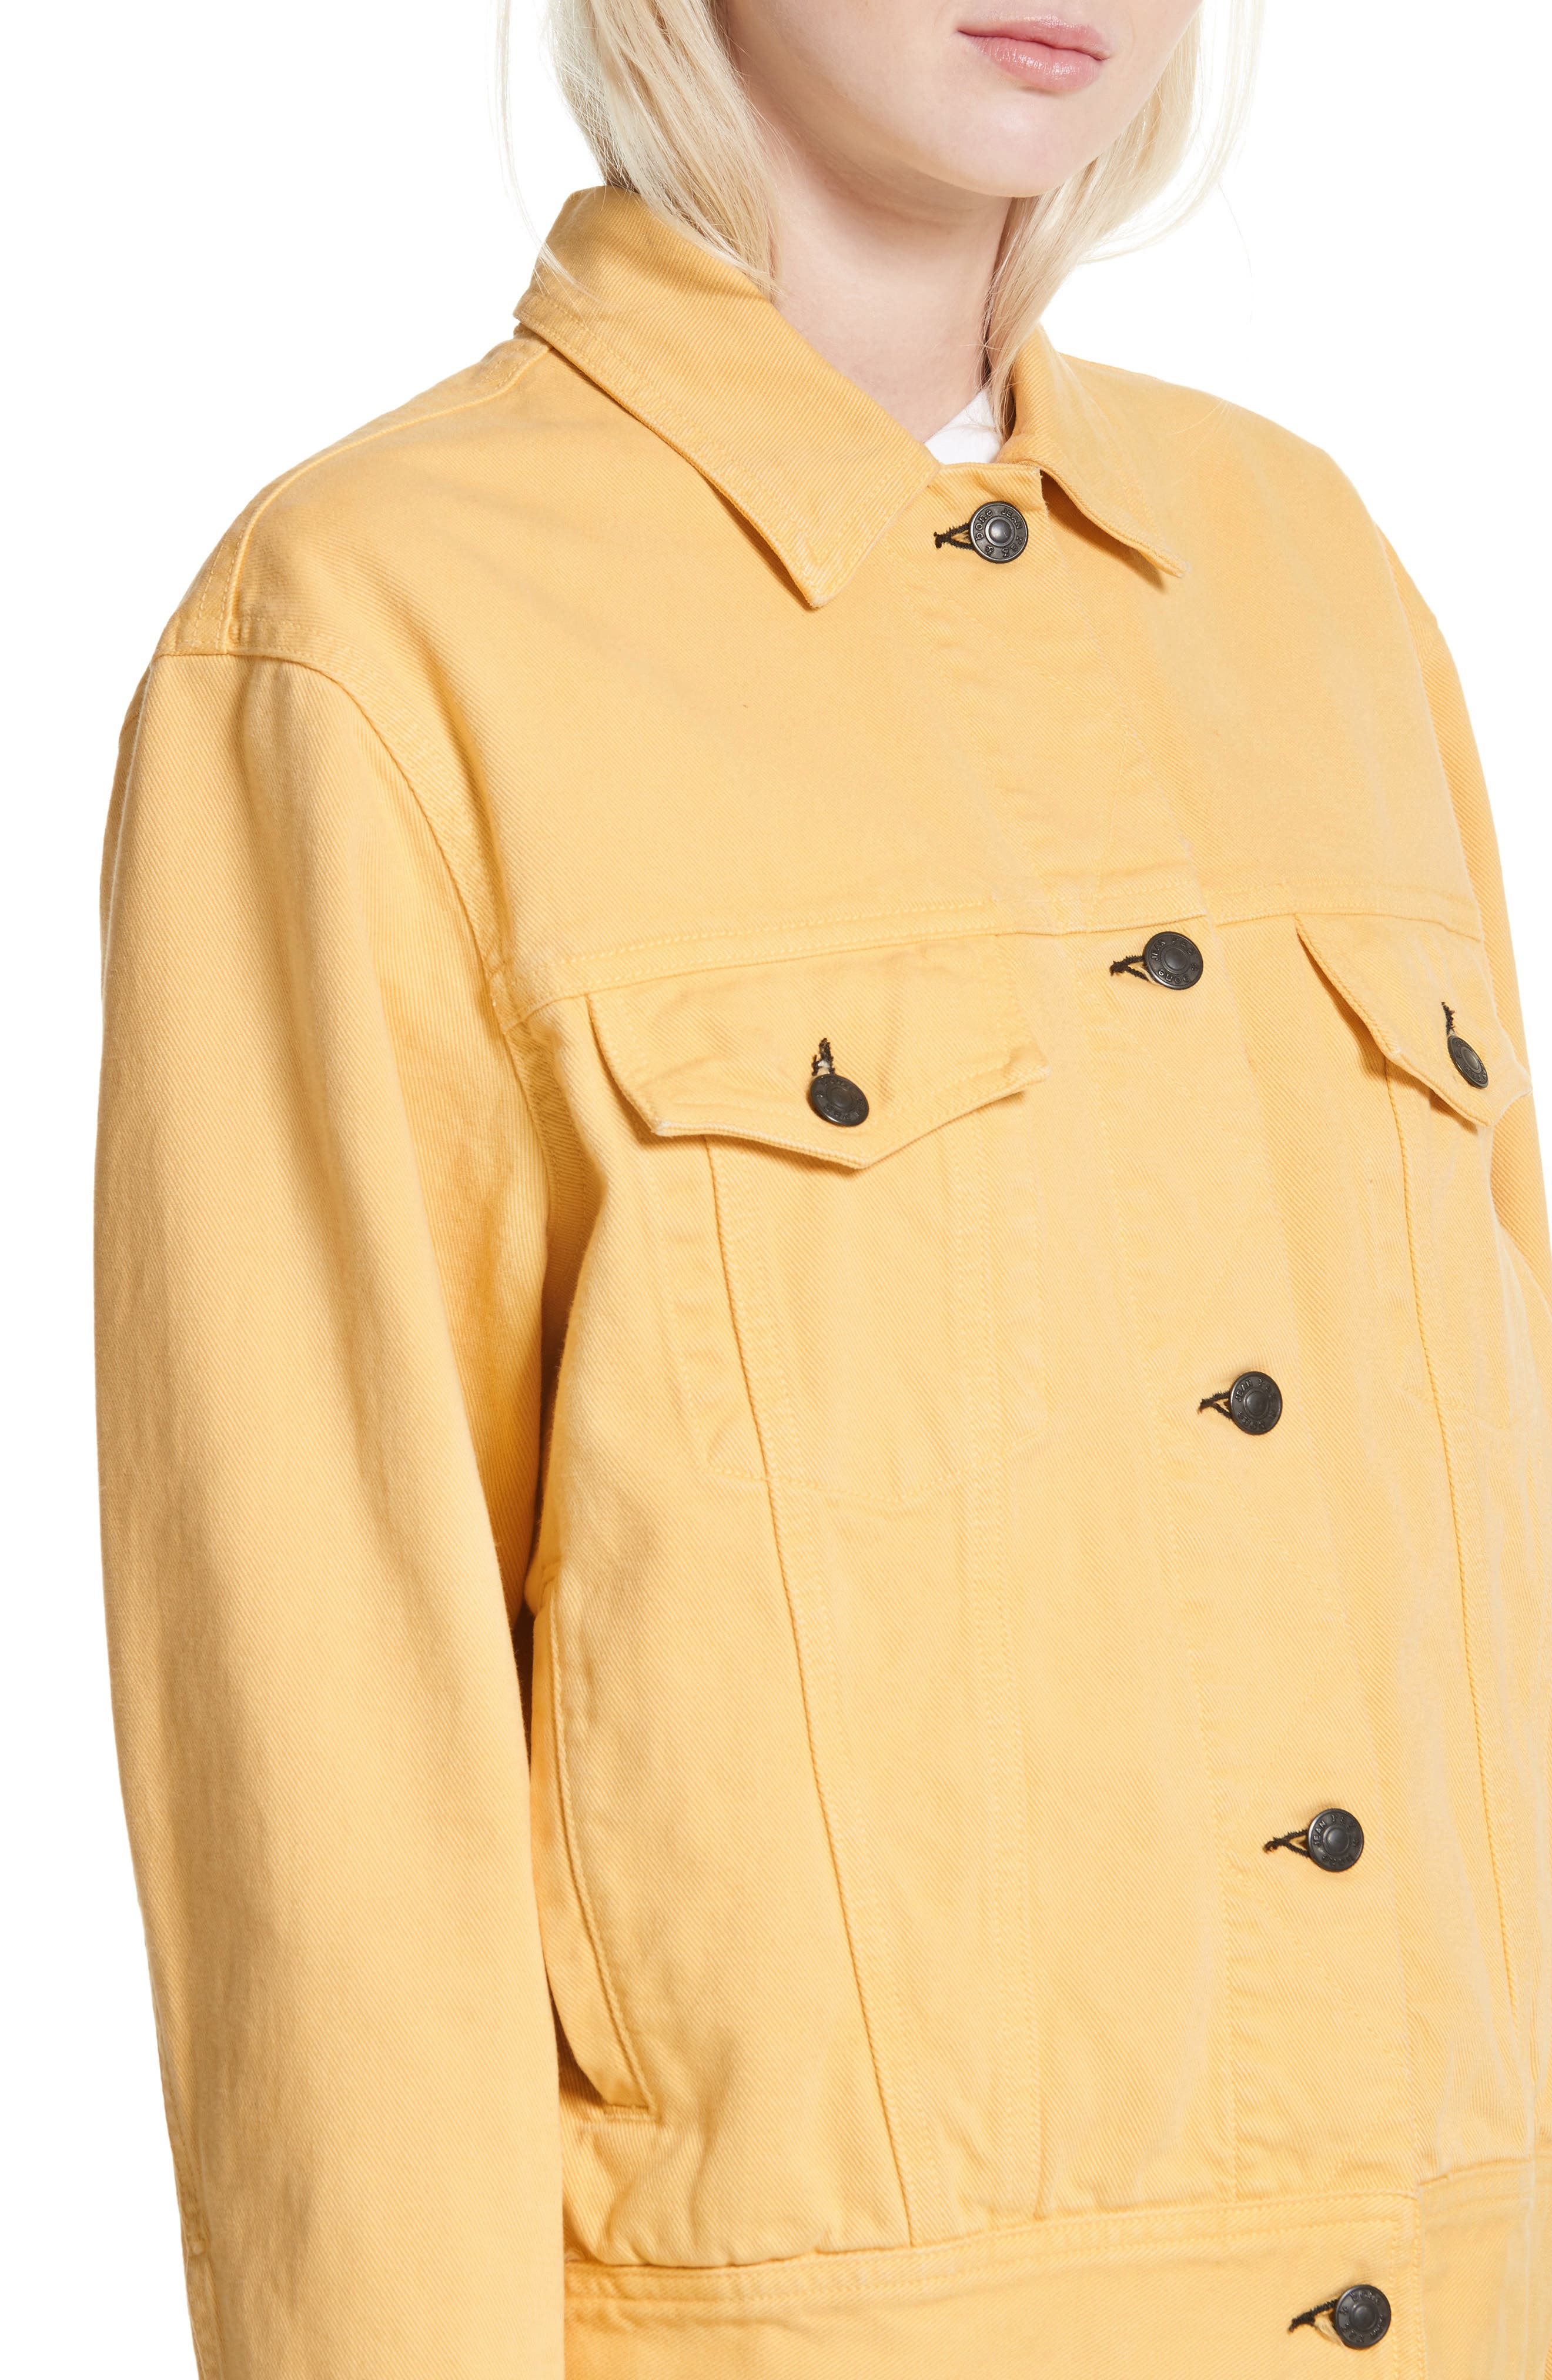 rag & bone Oversize Twill Jacket,                             Alternate thumbnail 4, color,